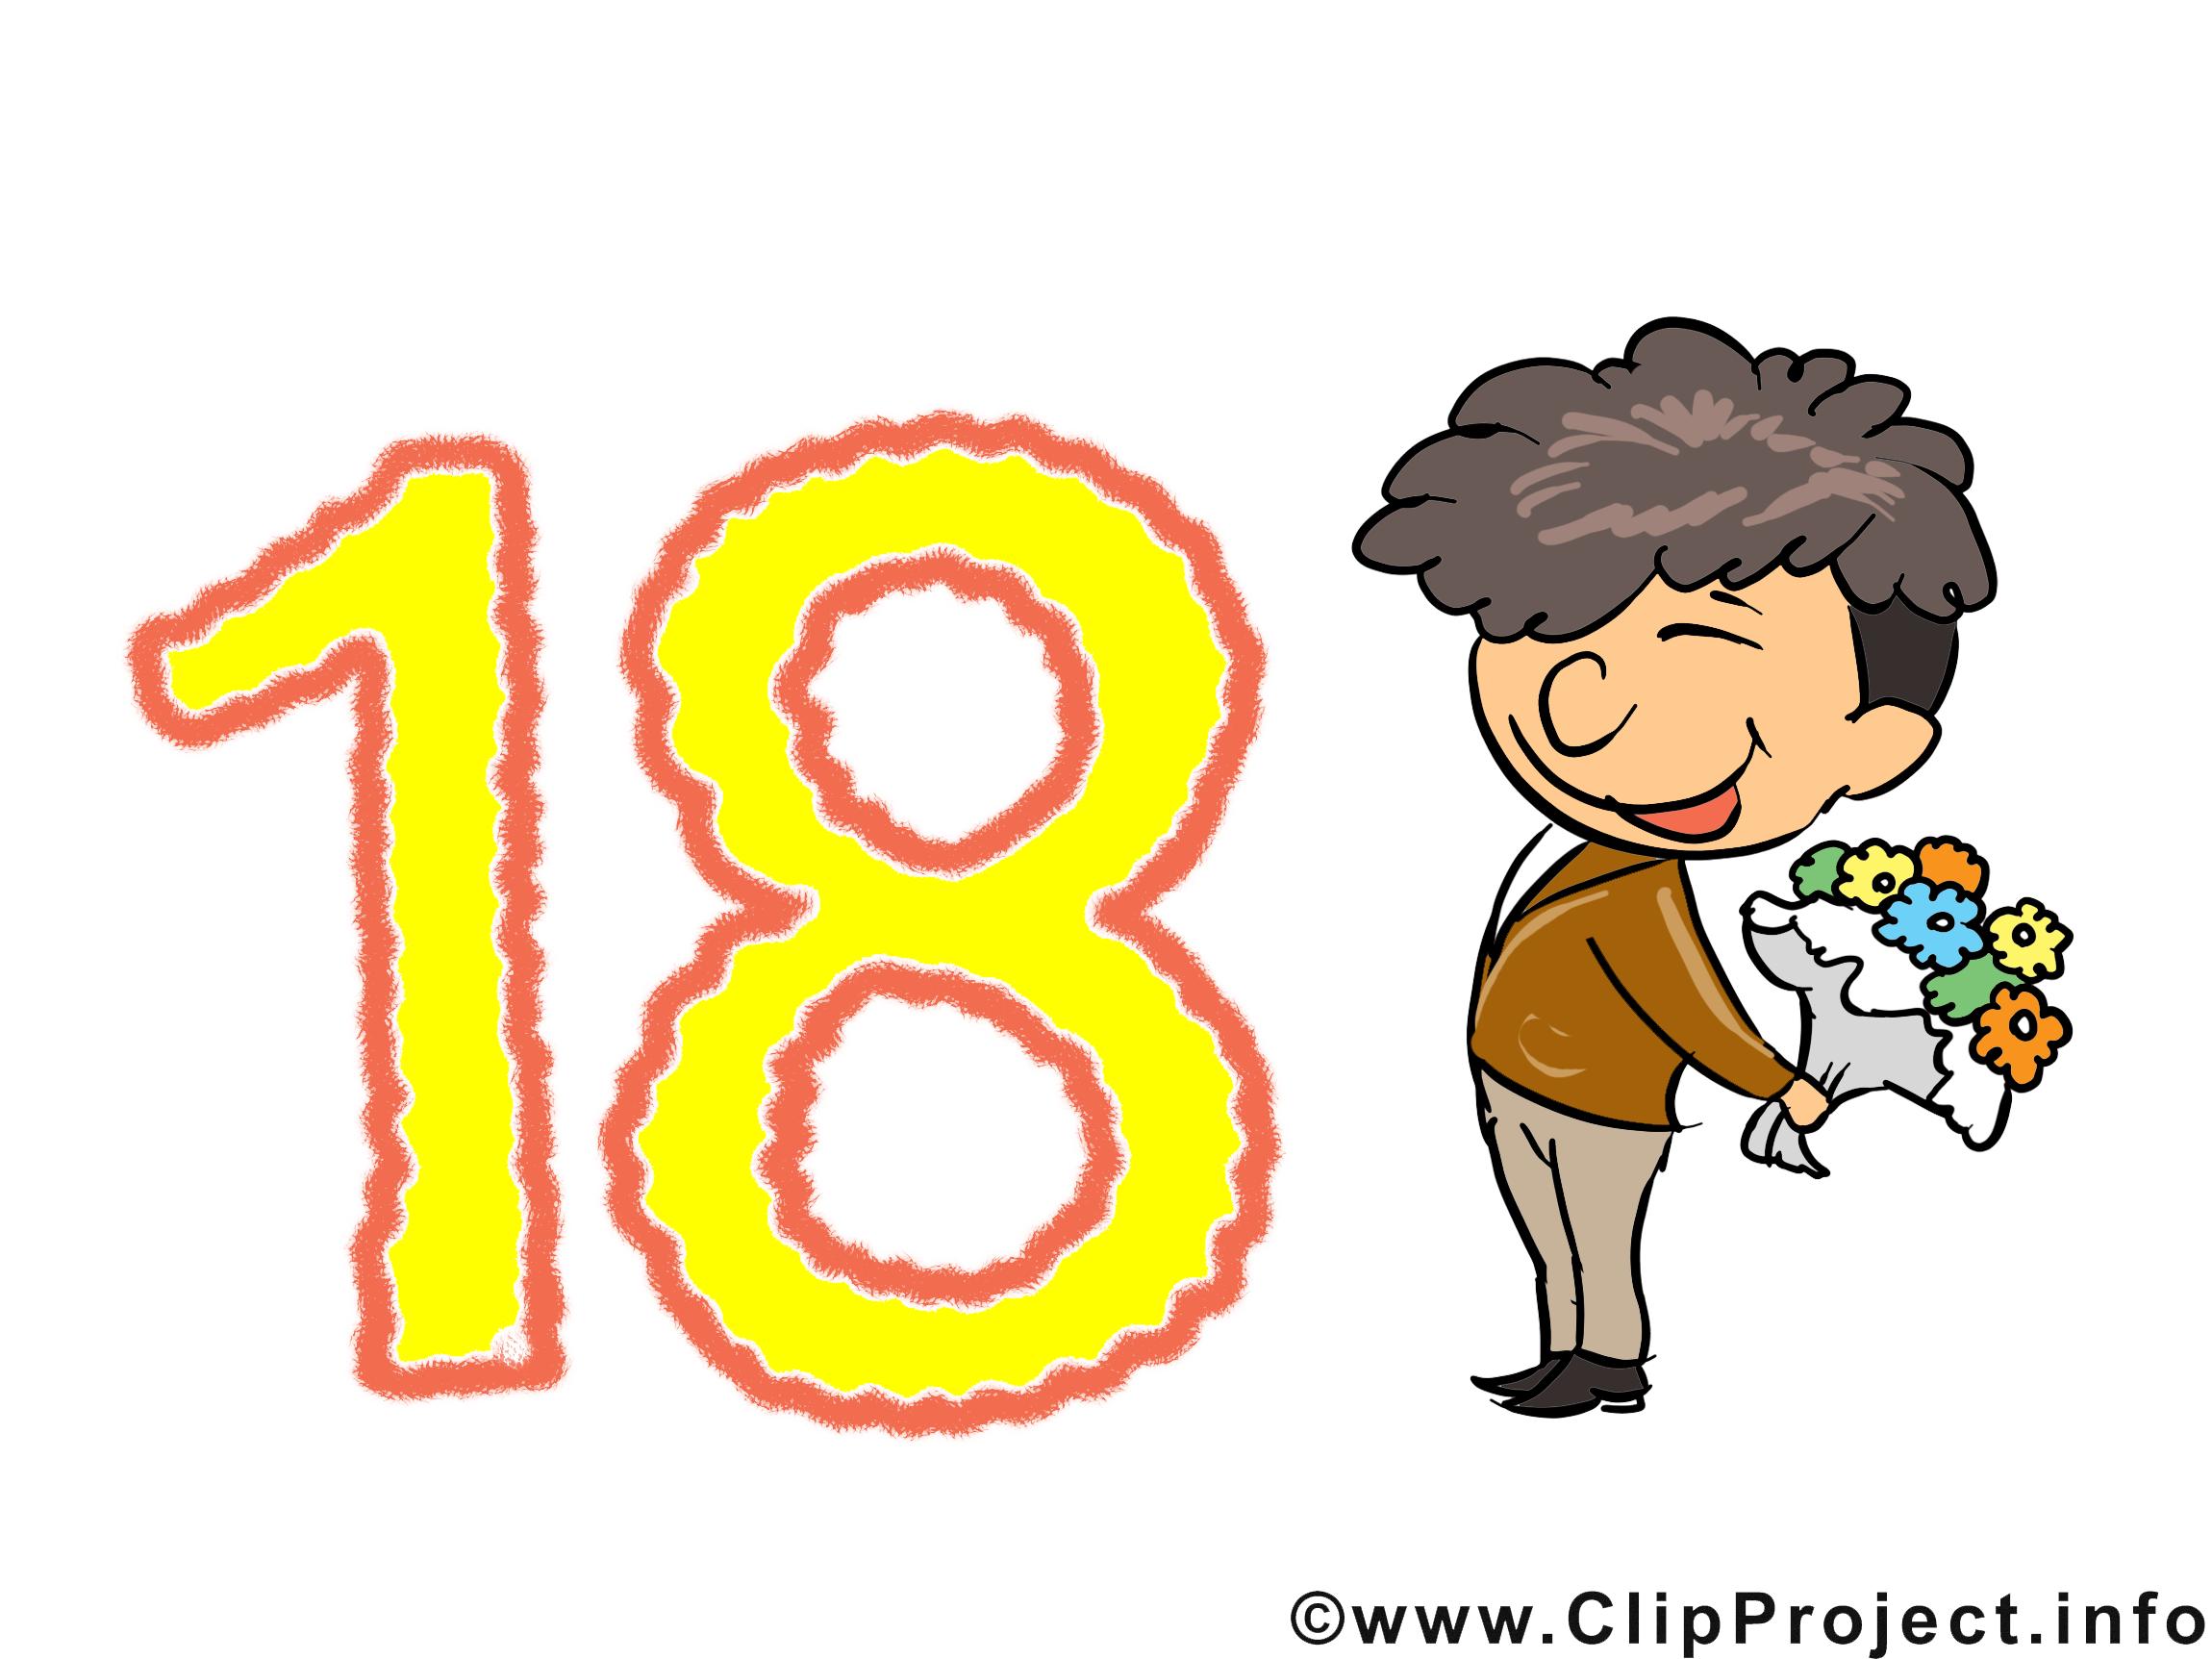 Cliparts zum 18 geburtstag picture library Cliparts zum 18 geburtstag - ClipartFox picture library